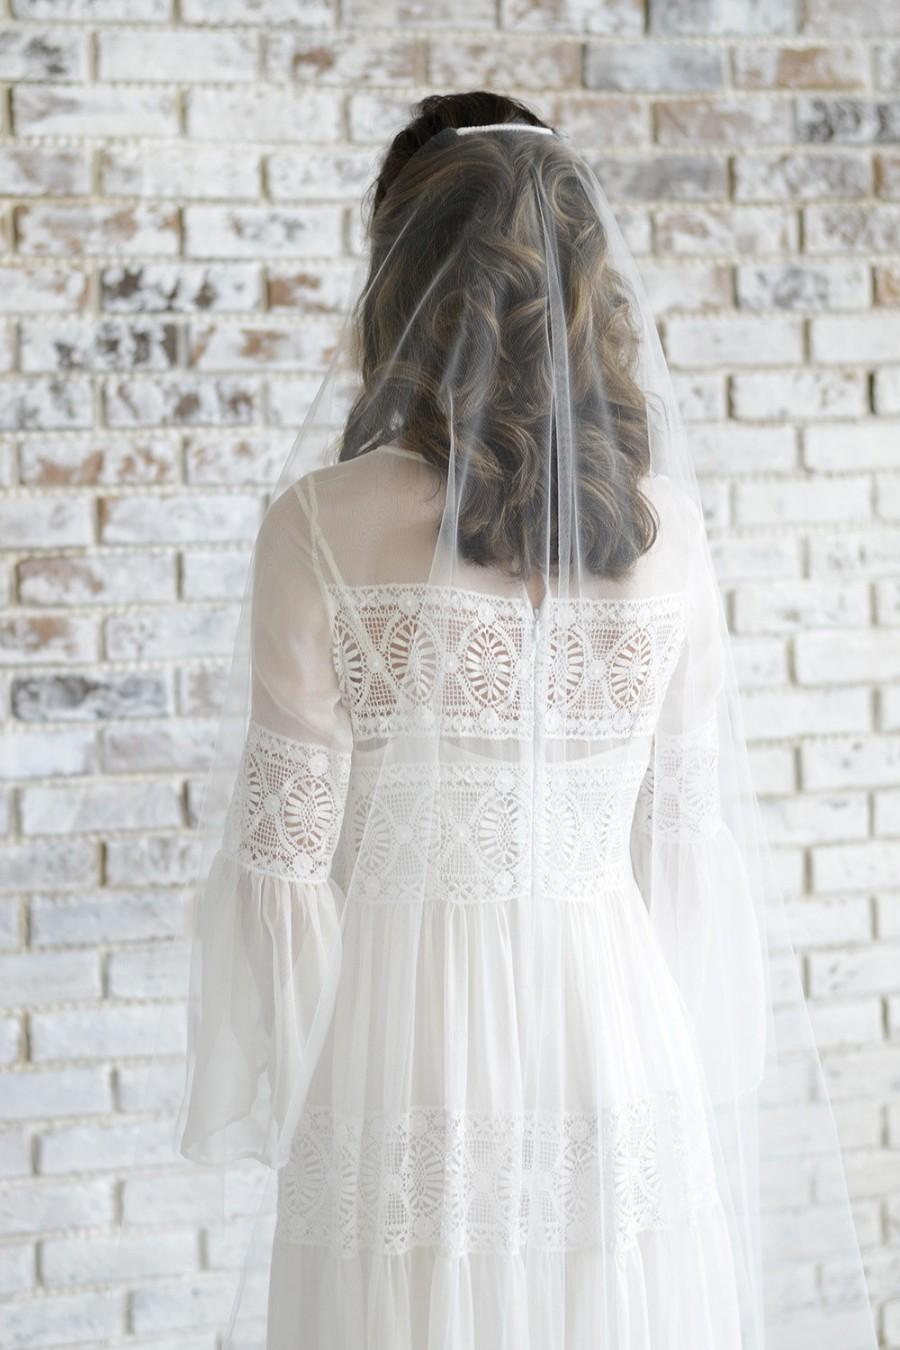 Mariage - Minimalist wedding veil, barely there veil, minimal veil with comb, sheer veil sheer wedding veil simple veil raw edge veil single tier veil